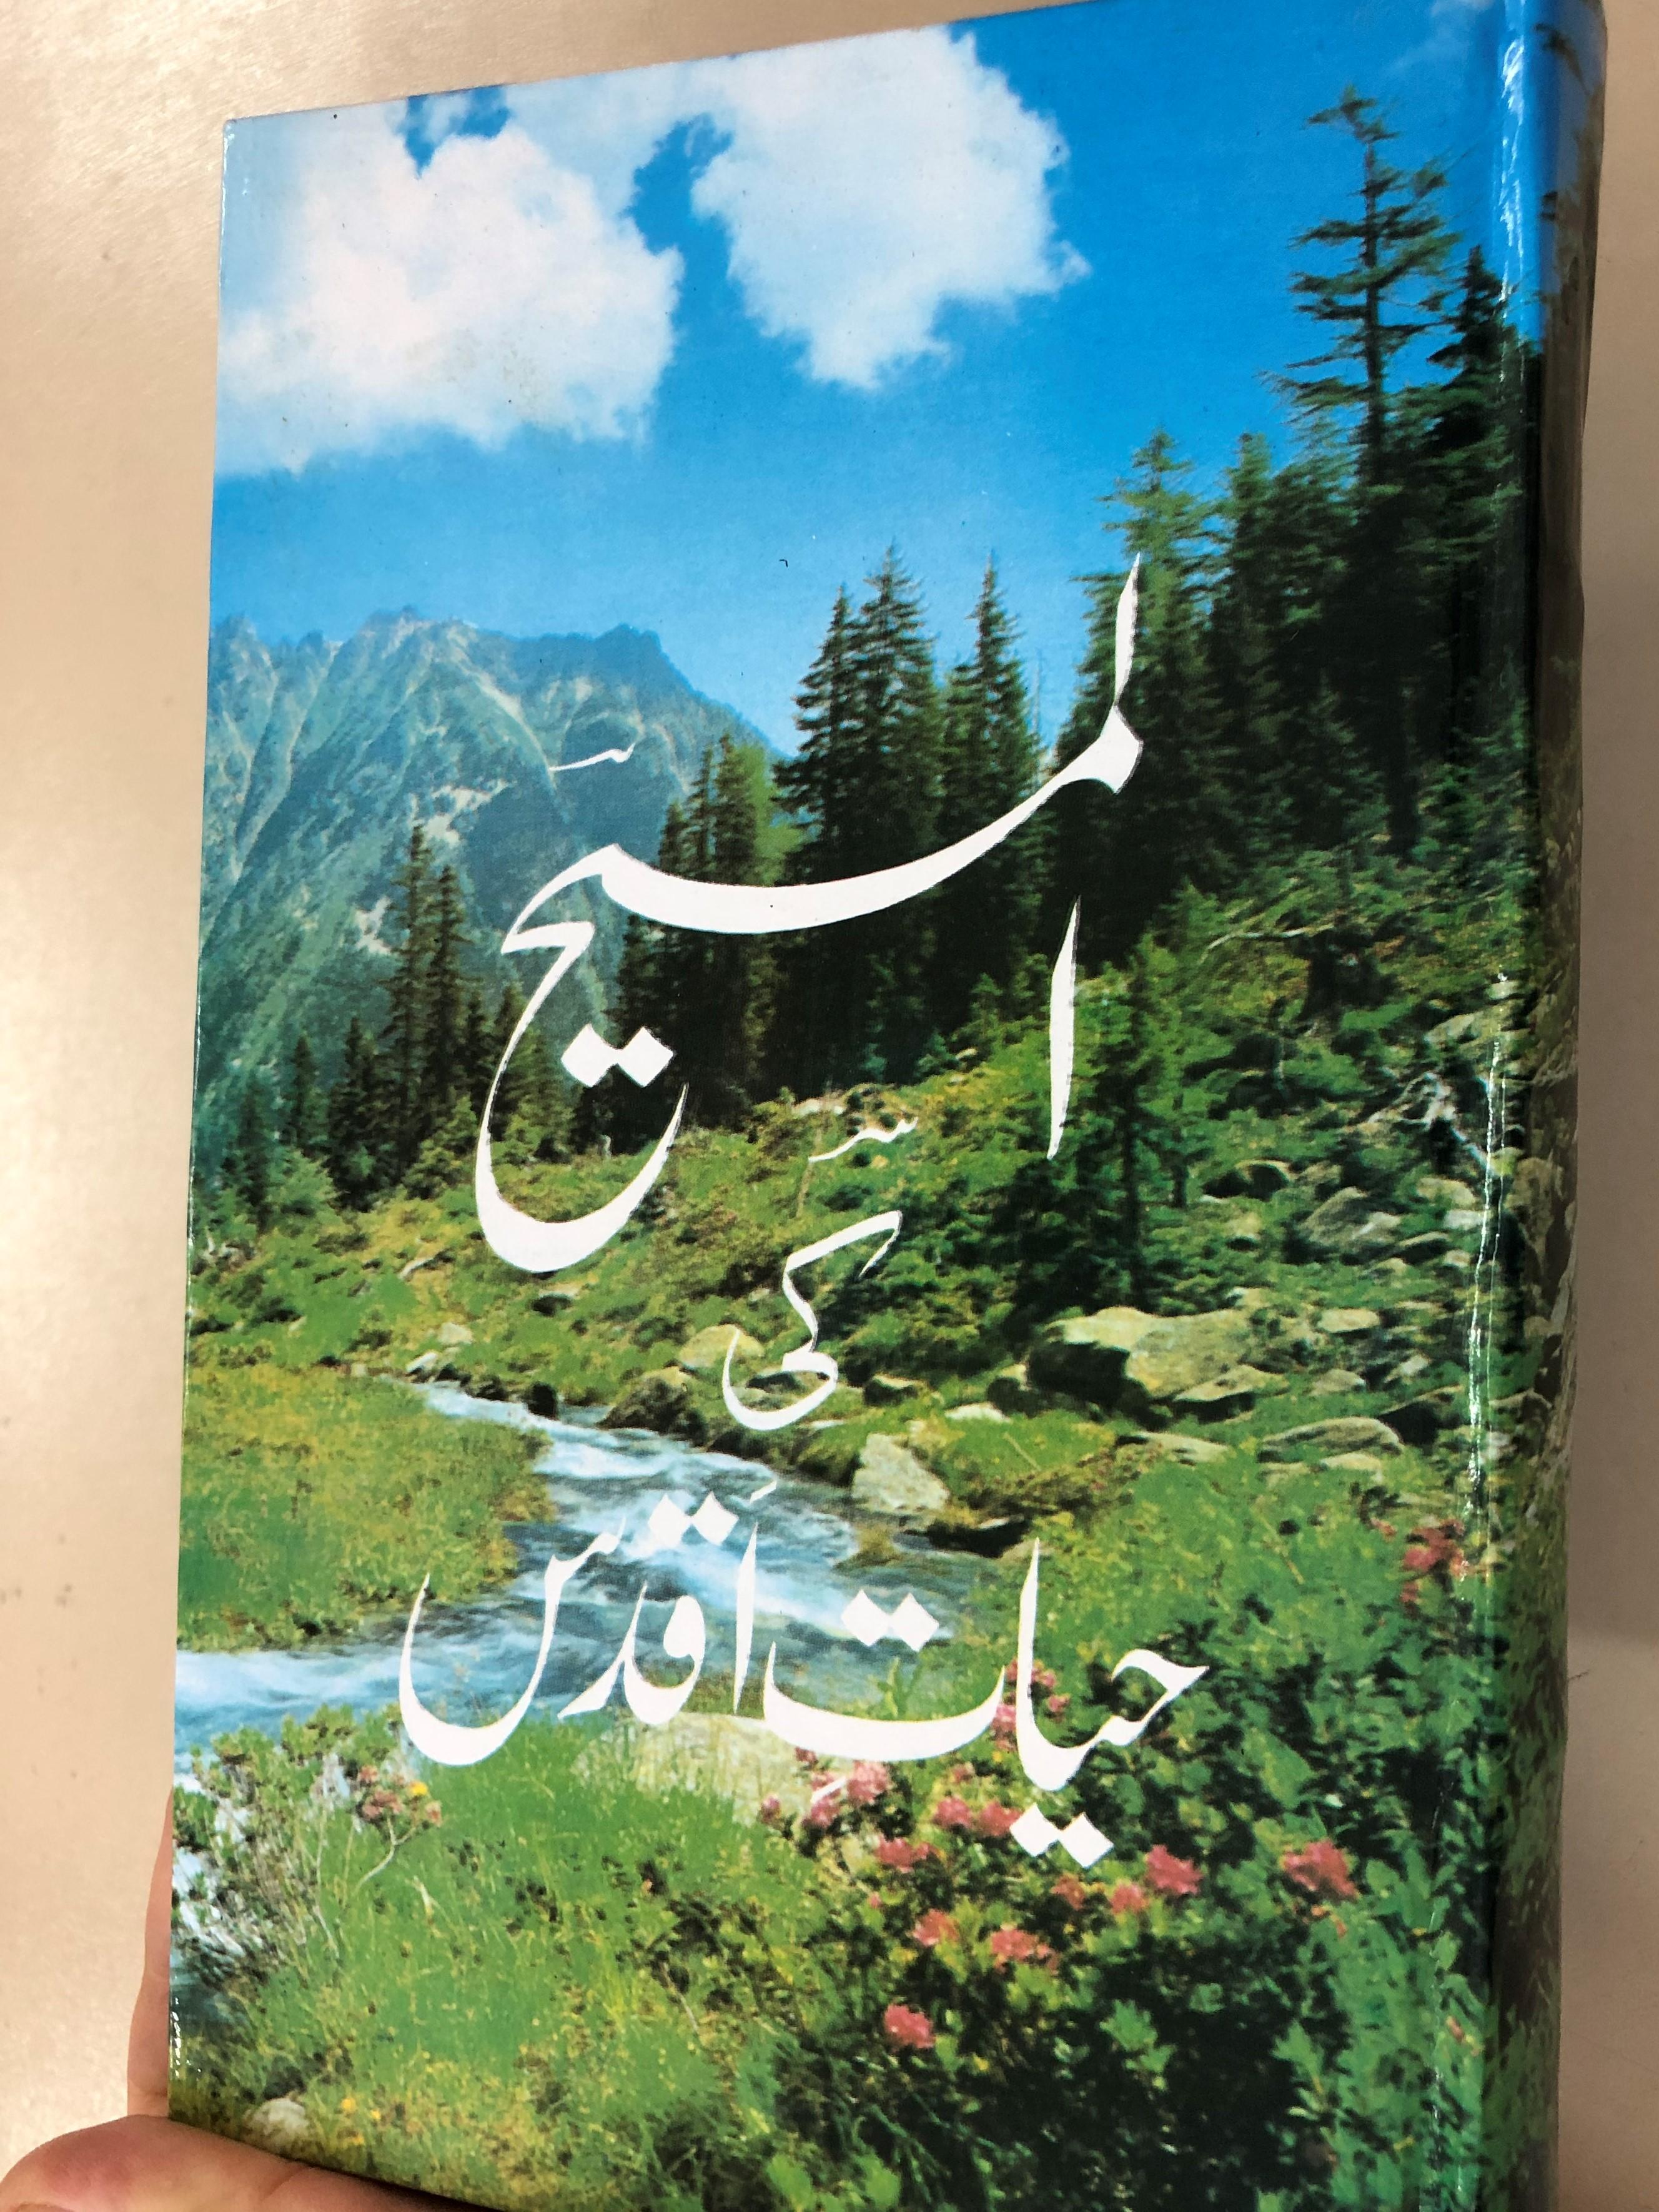 christ-the-conqueror-by-r.-becht-in-urdu-language-hardcover-2014-masihi-isha-at-khana-14-.jpg